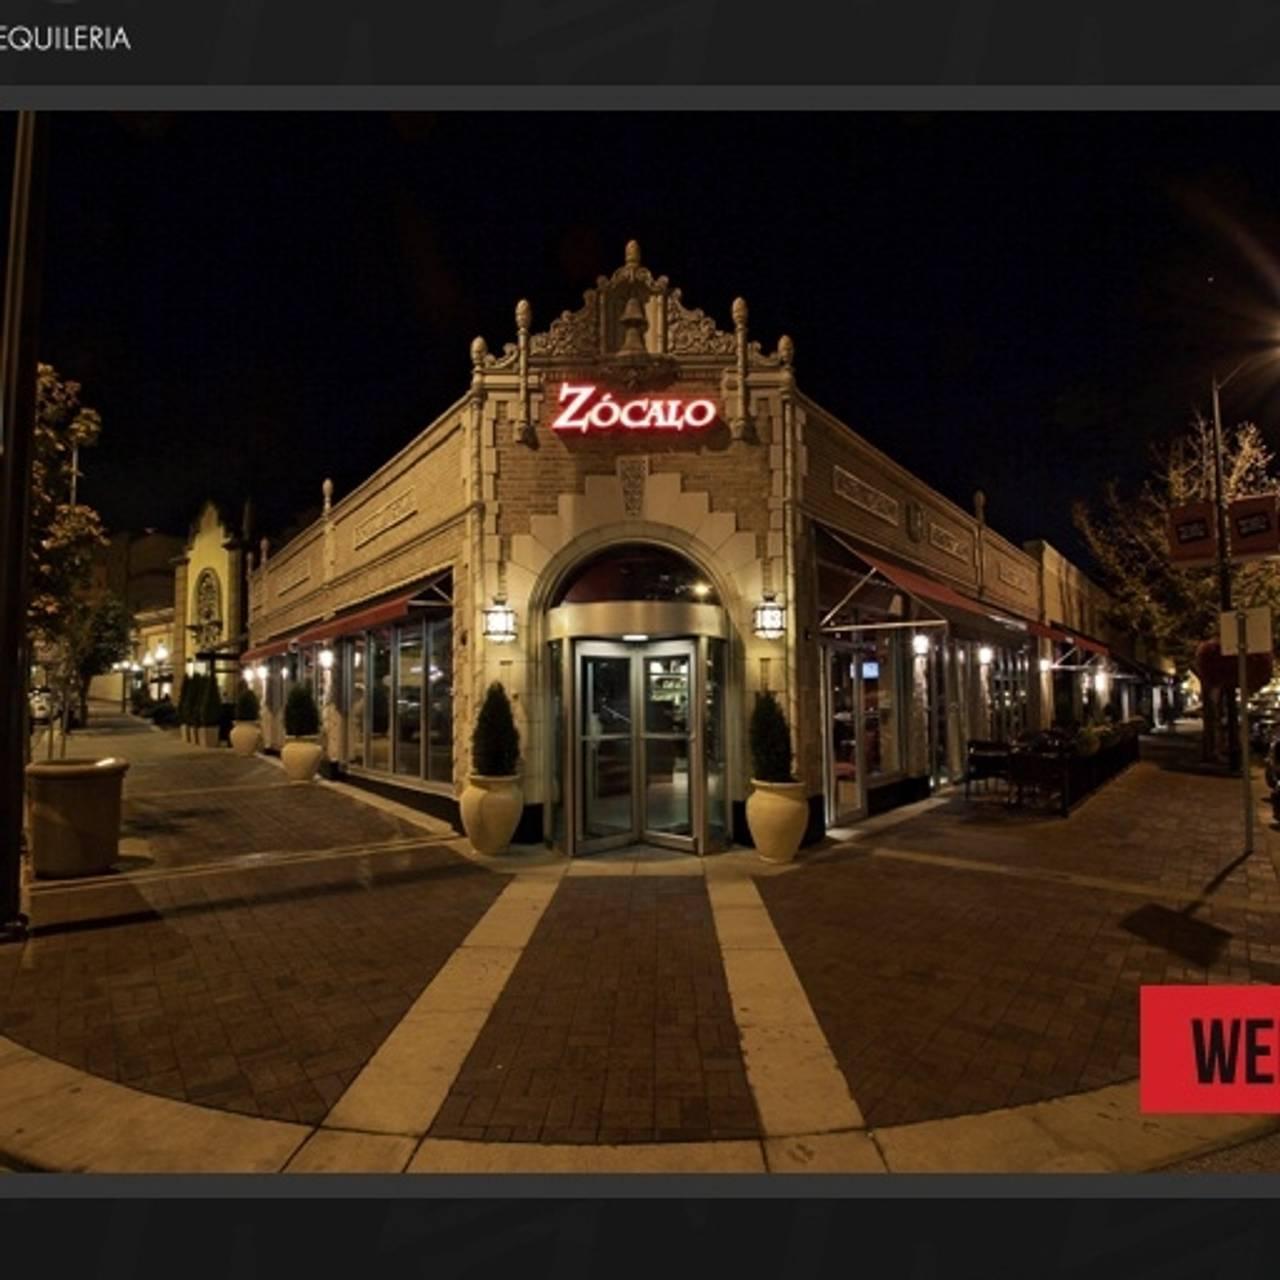 Zocalo Mexican Cuisine Tequileria Restaurant Kansas City